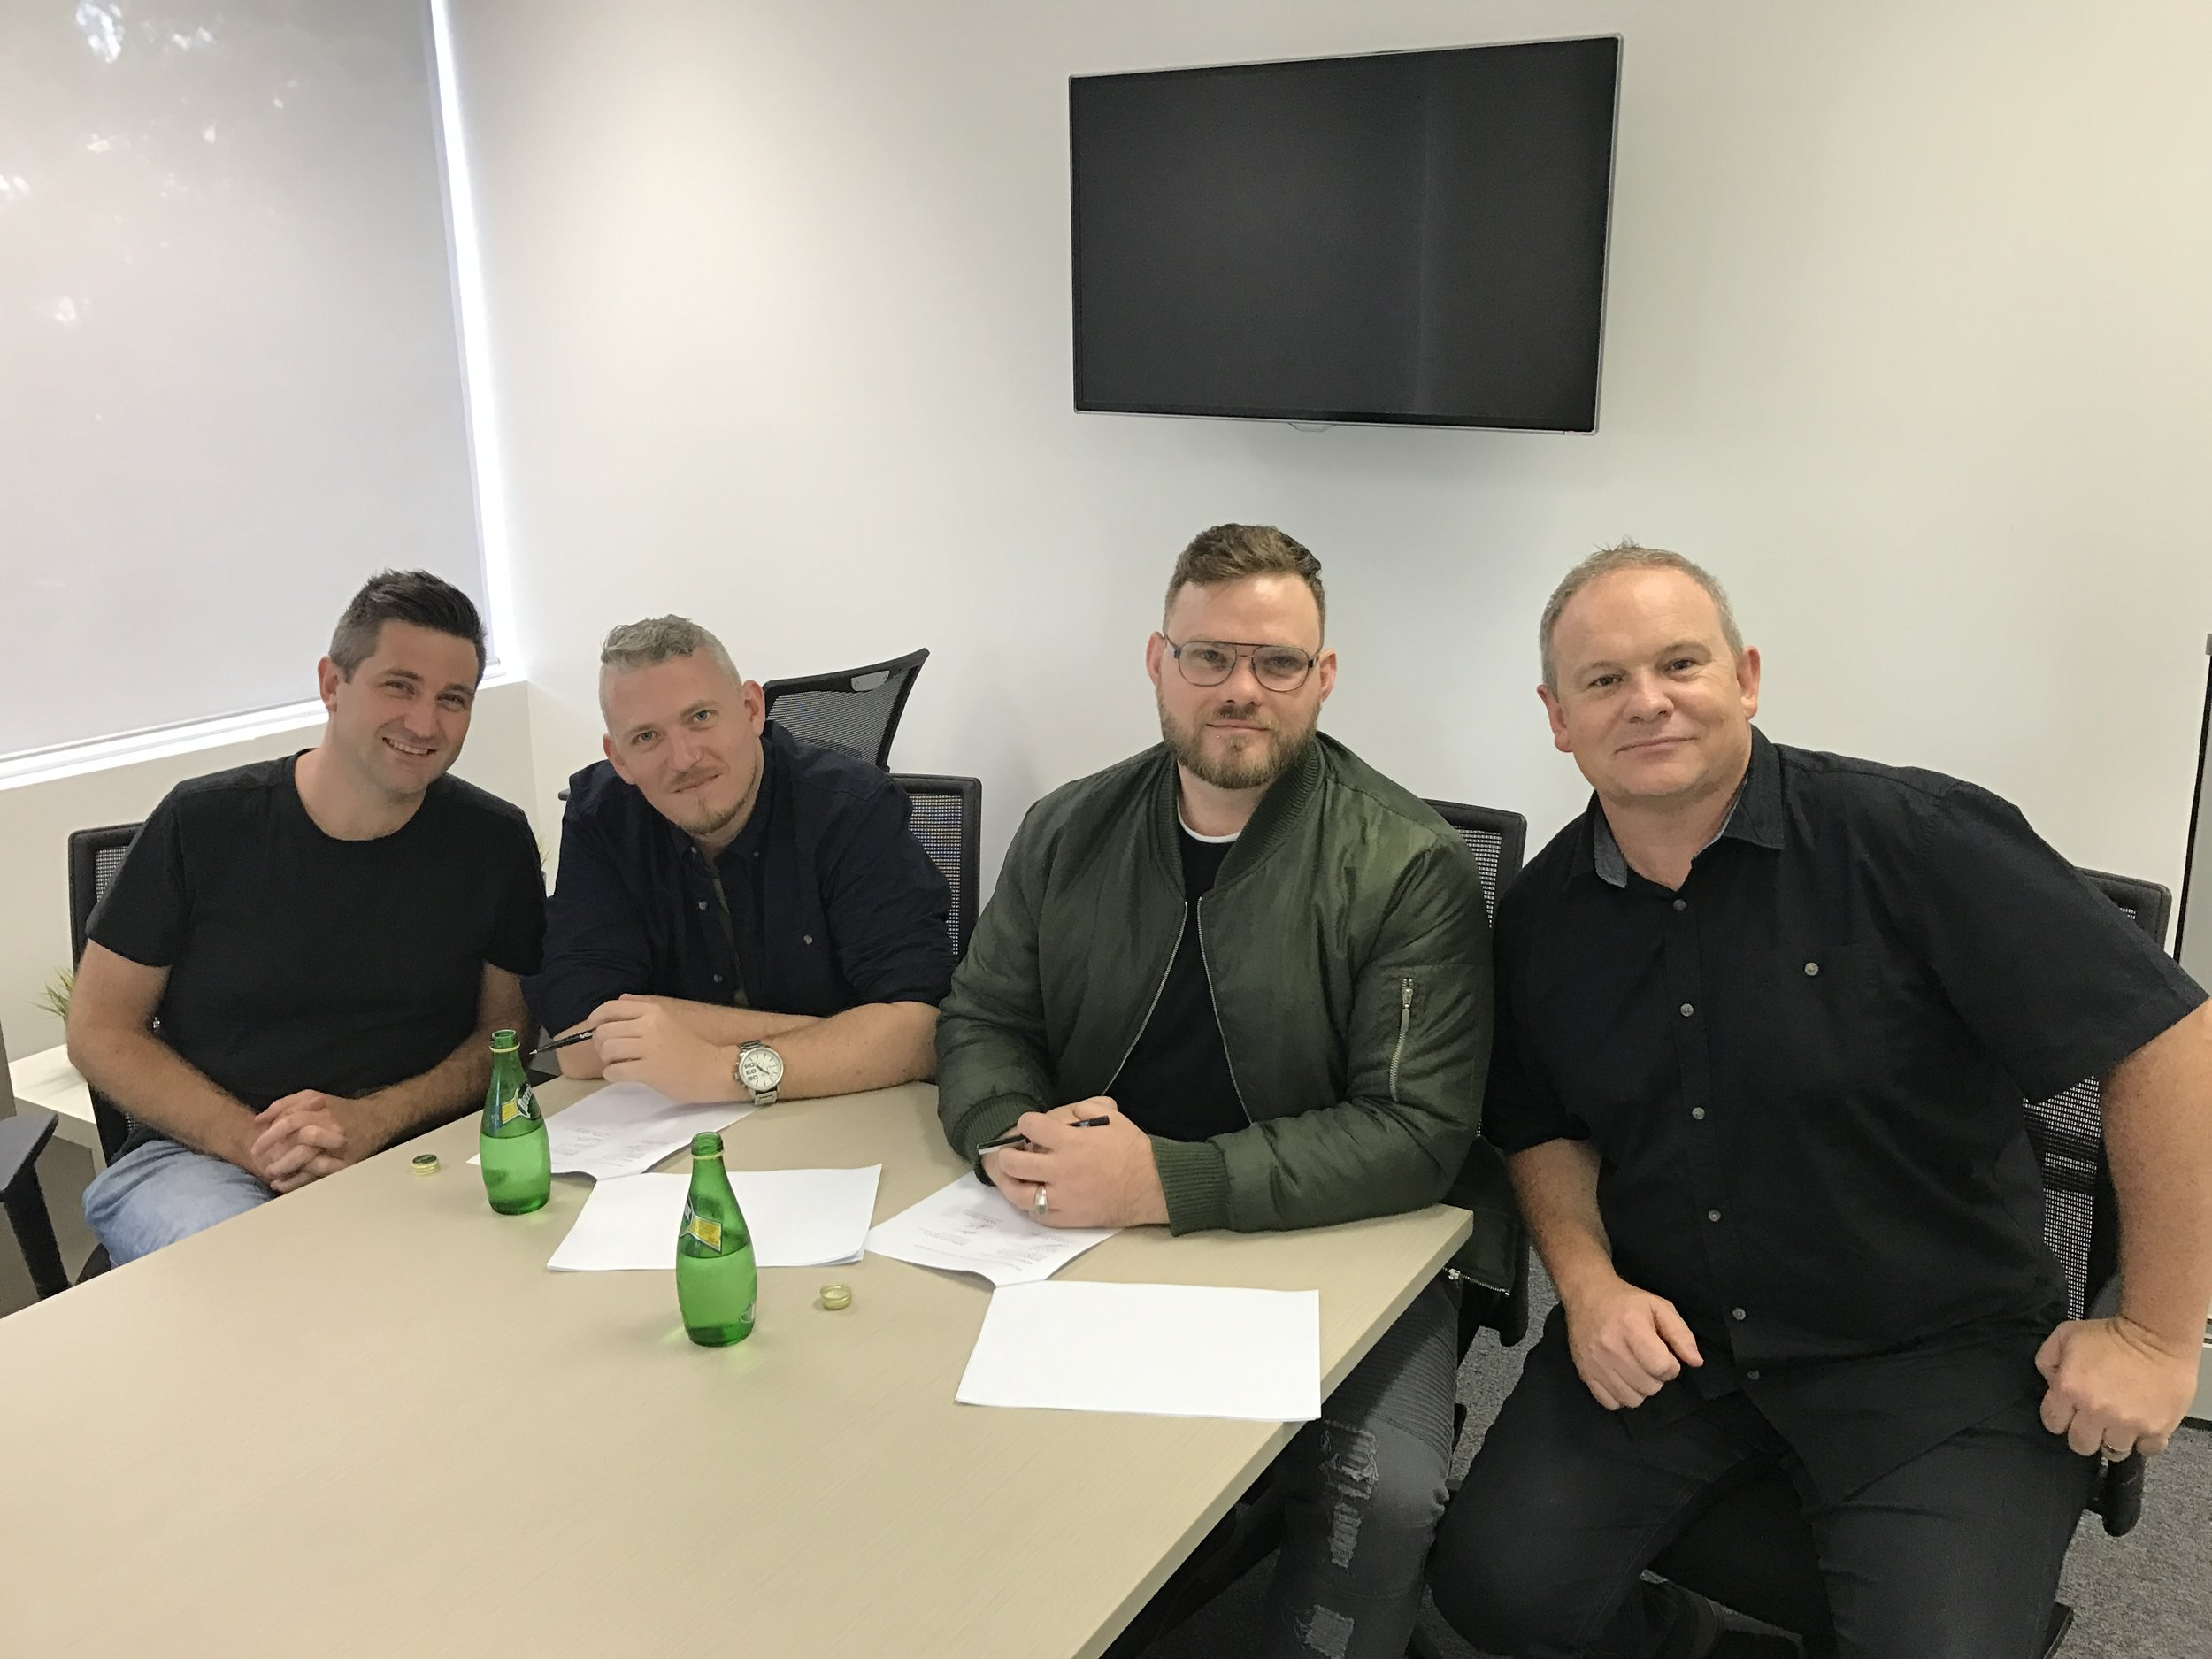 Left to right – Nathan Eshman (A&R – SHOUT!), Josh Banton, Ben Banton, Steve McPherson (CEO – SHOUT!)